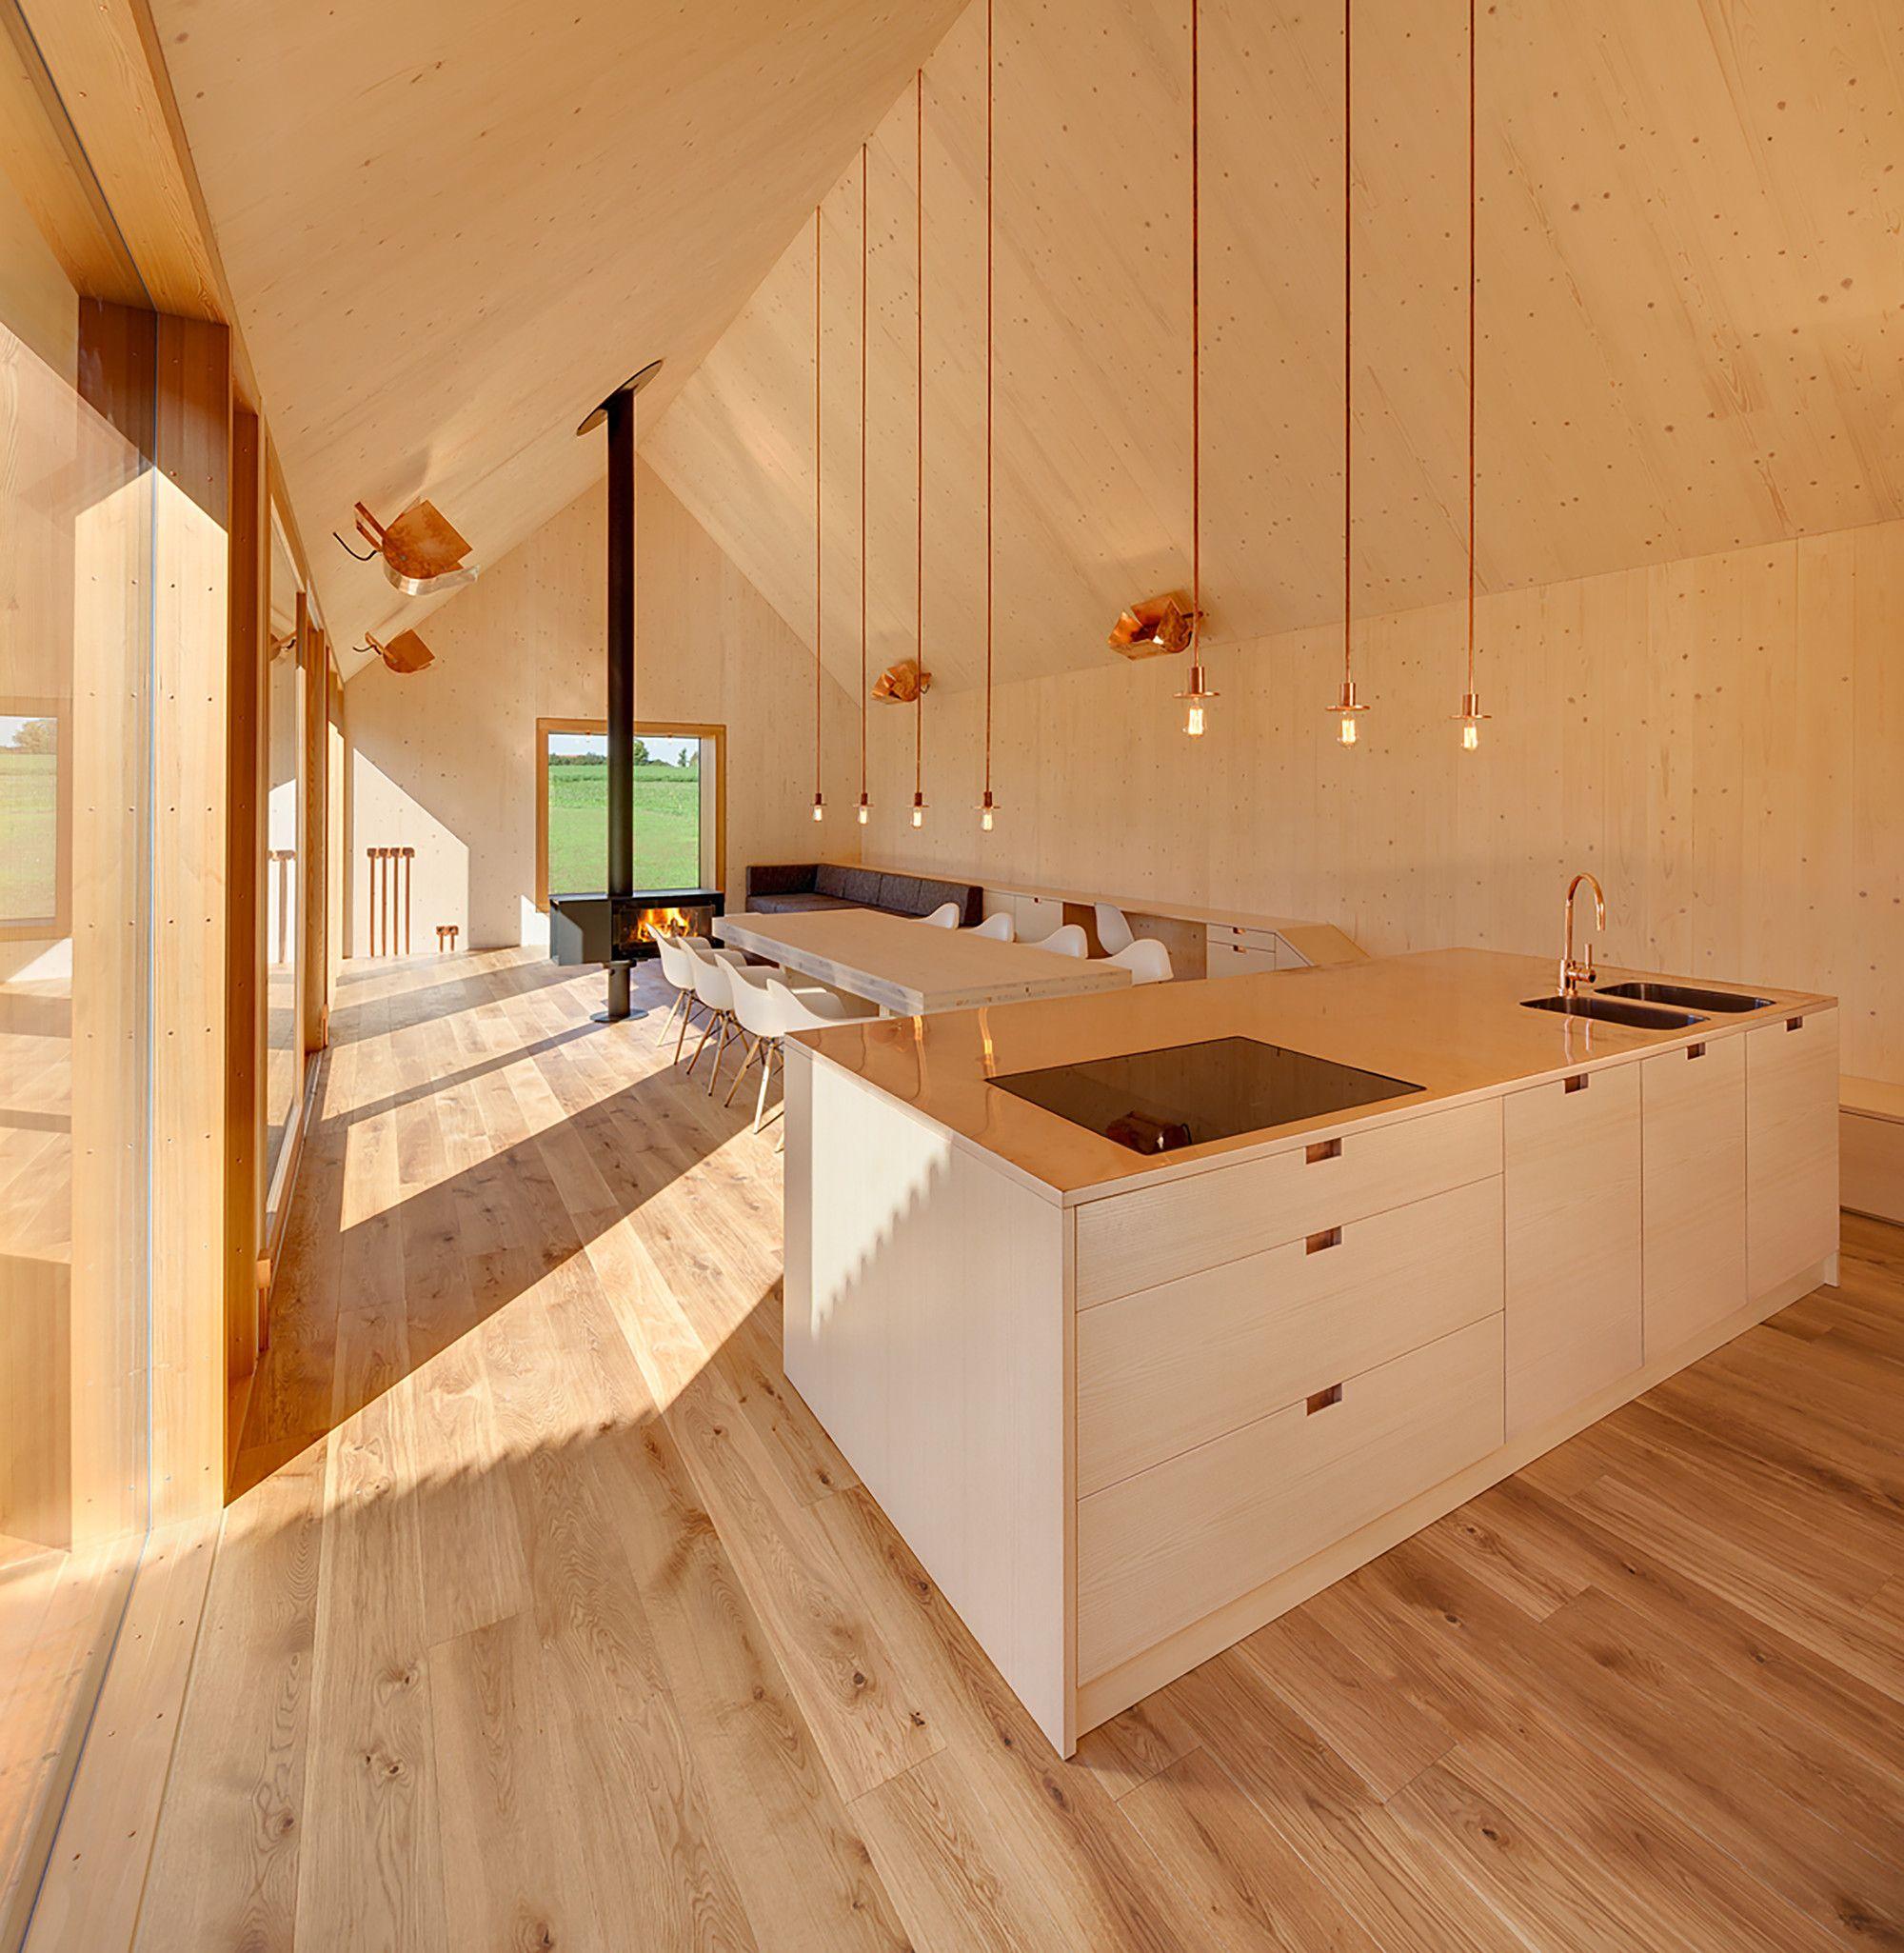 Gallery of timber house kÜhnlein architektur timber house